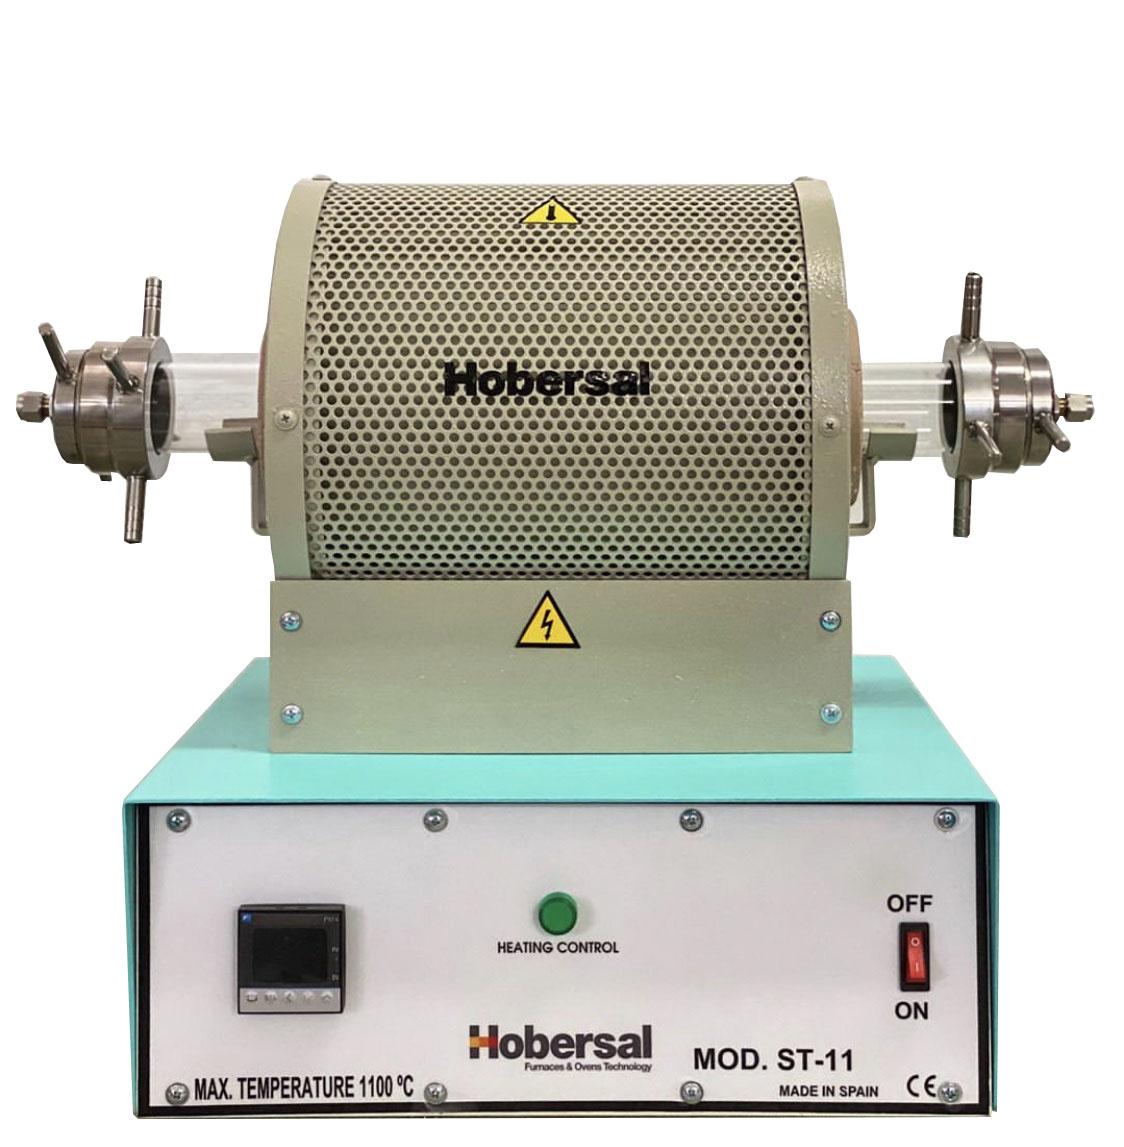 ST115020 Universal tube furnace Hobersal